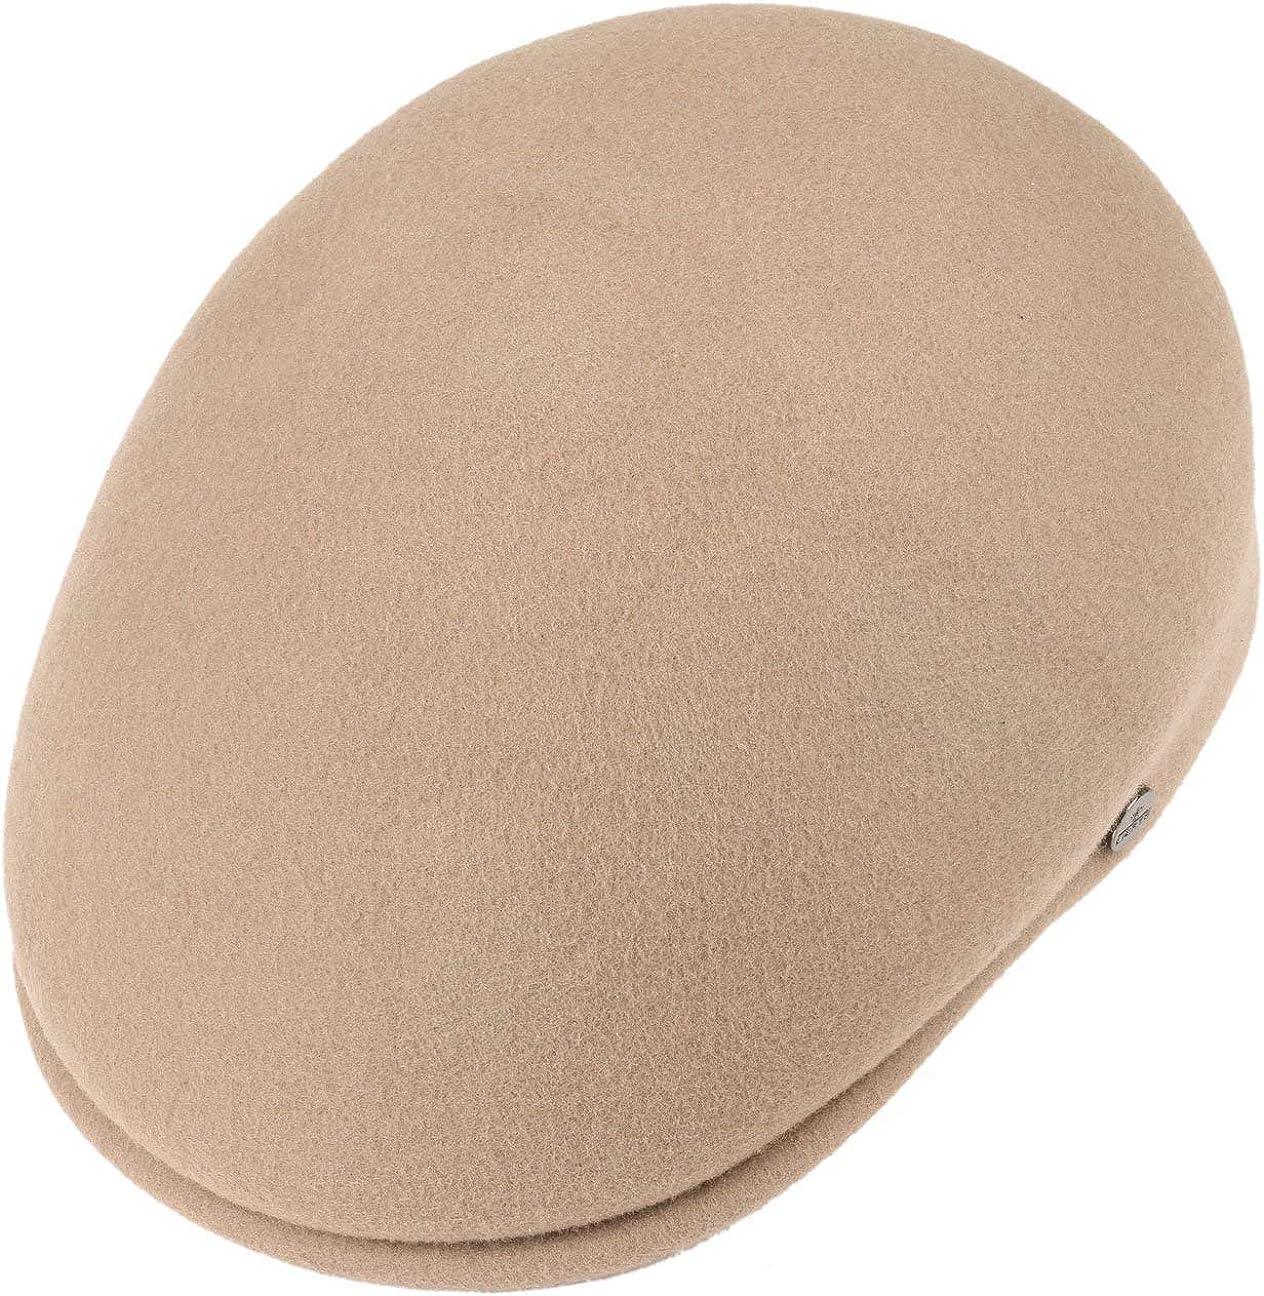 Flat Cap Lierys Mens Outdoor Flat Cap Made of Wool Felt Fall//Winter Sports Cap Water-Repellent /& Packable Flat Cap Cap Made in Italy